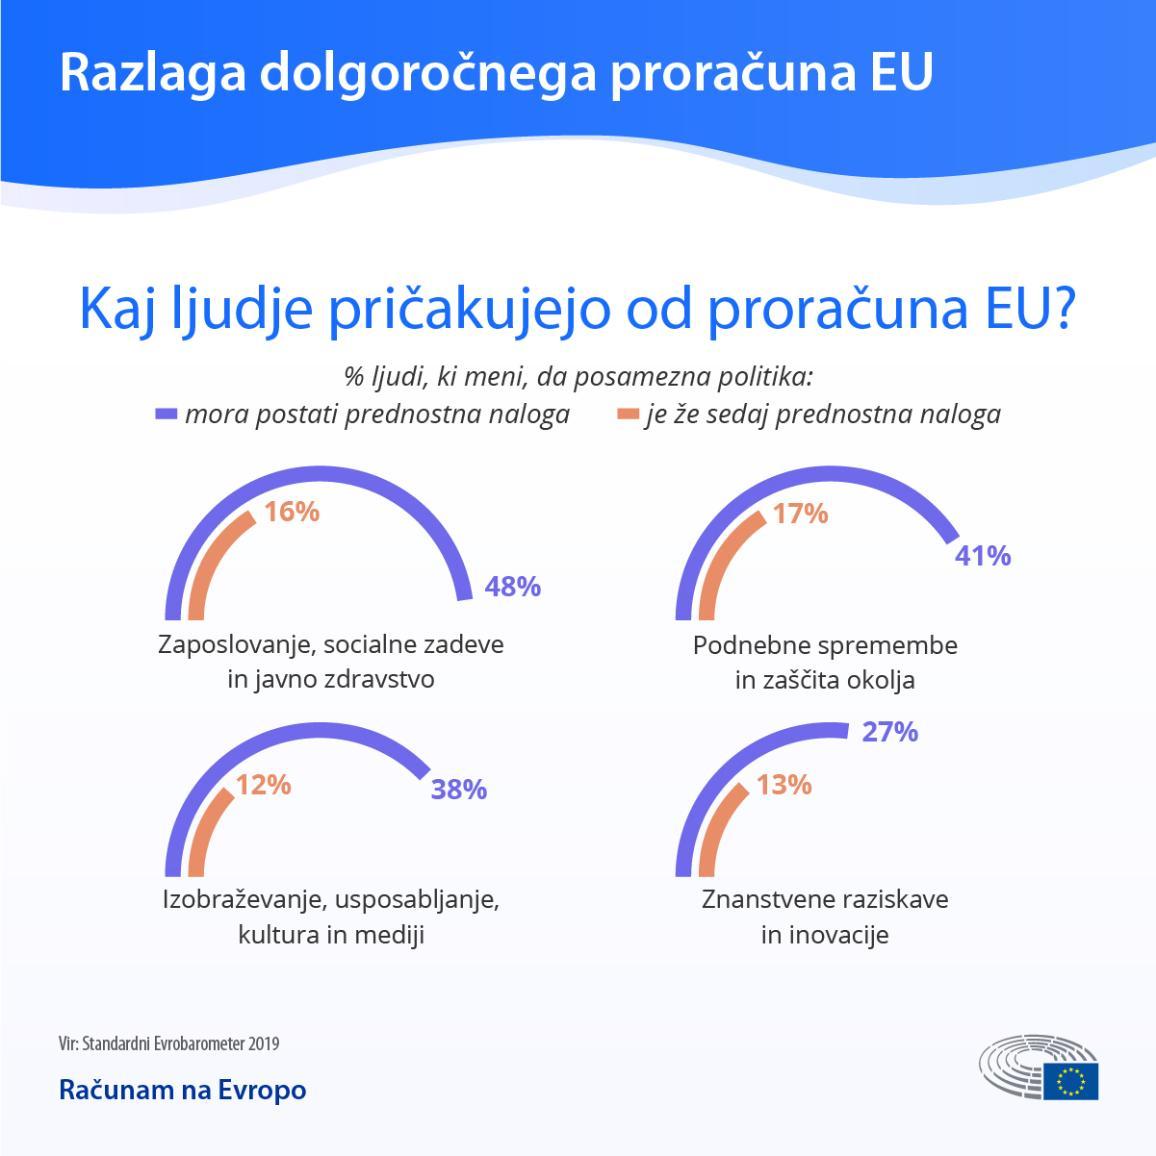 Podpora Parlamenta ambicioznemu dolgoročnemu proračunu EU